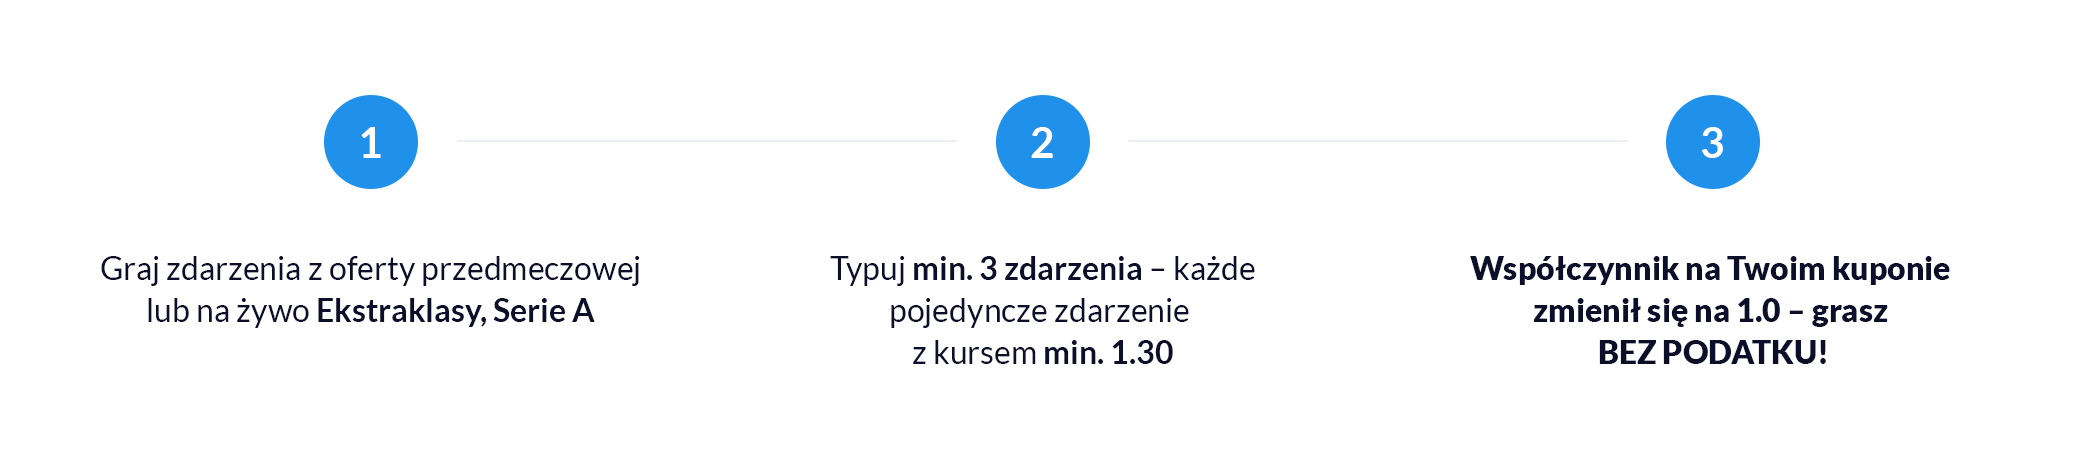 sa_esktra_3punkty_desktop.png